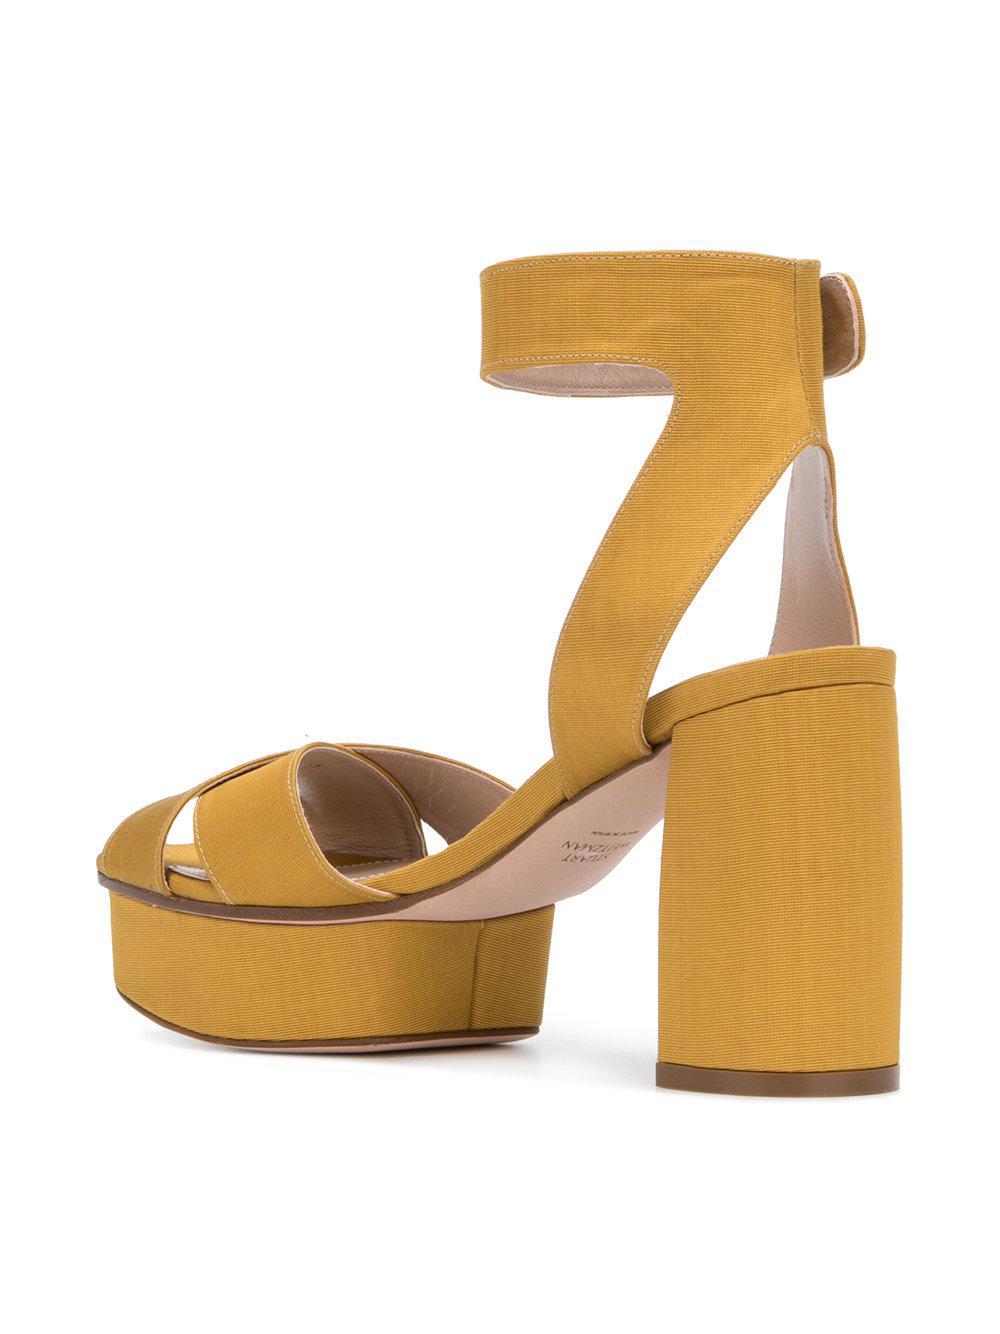 d91025c3fe3 Stuart Weitzman Carmina Platform Sandals in Metallic - Lyst